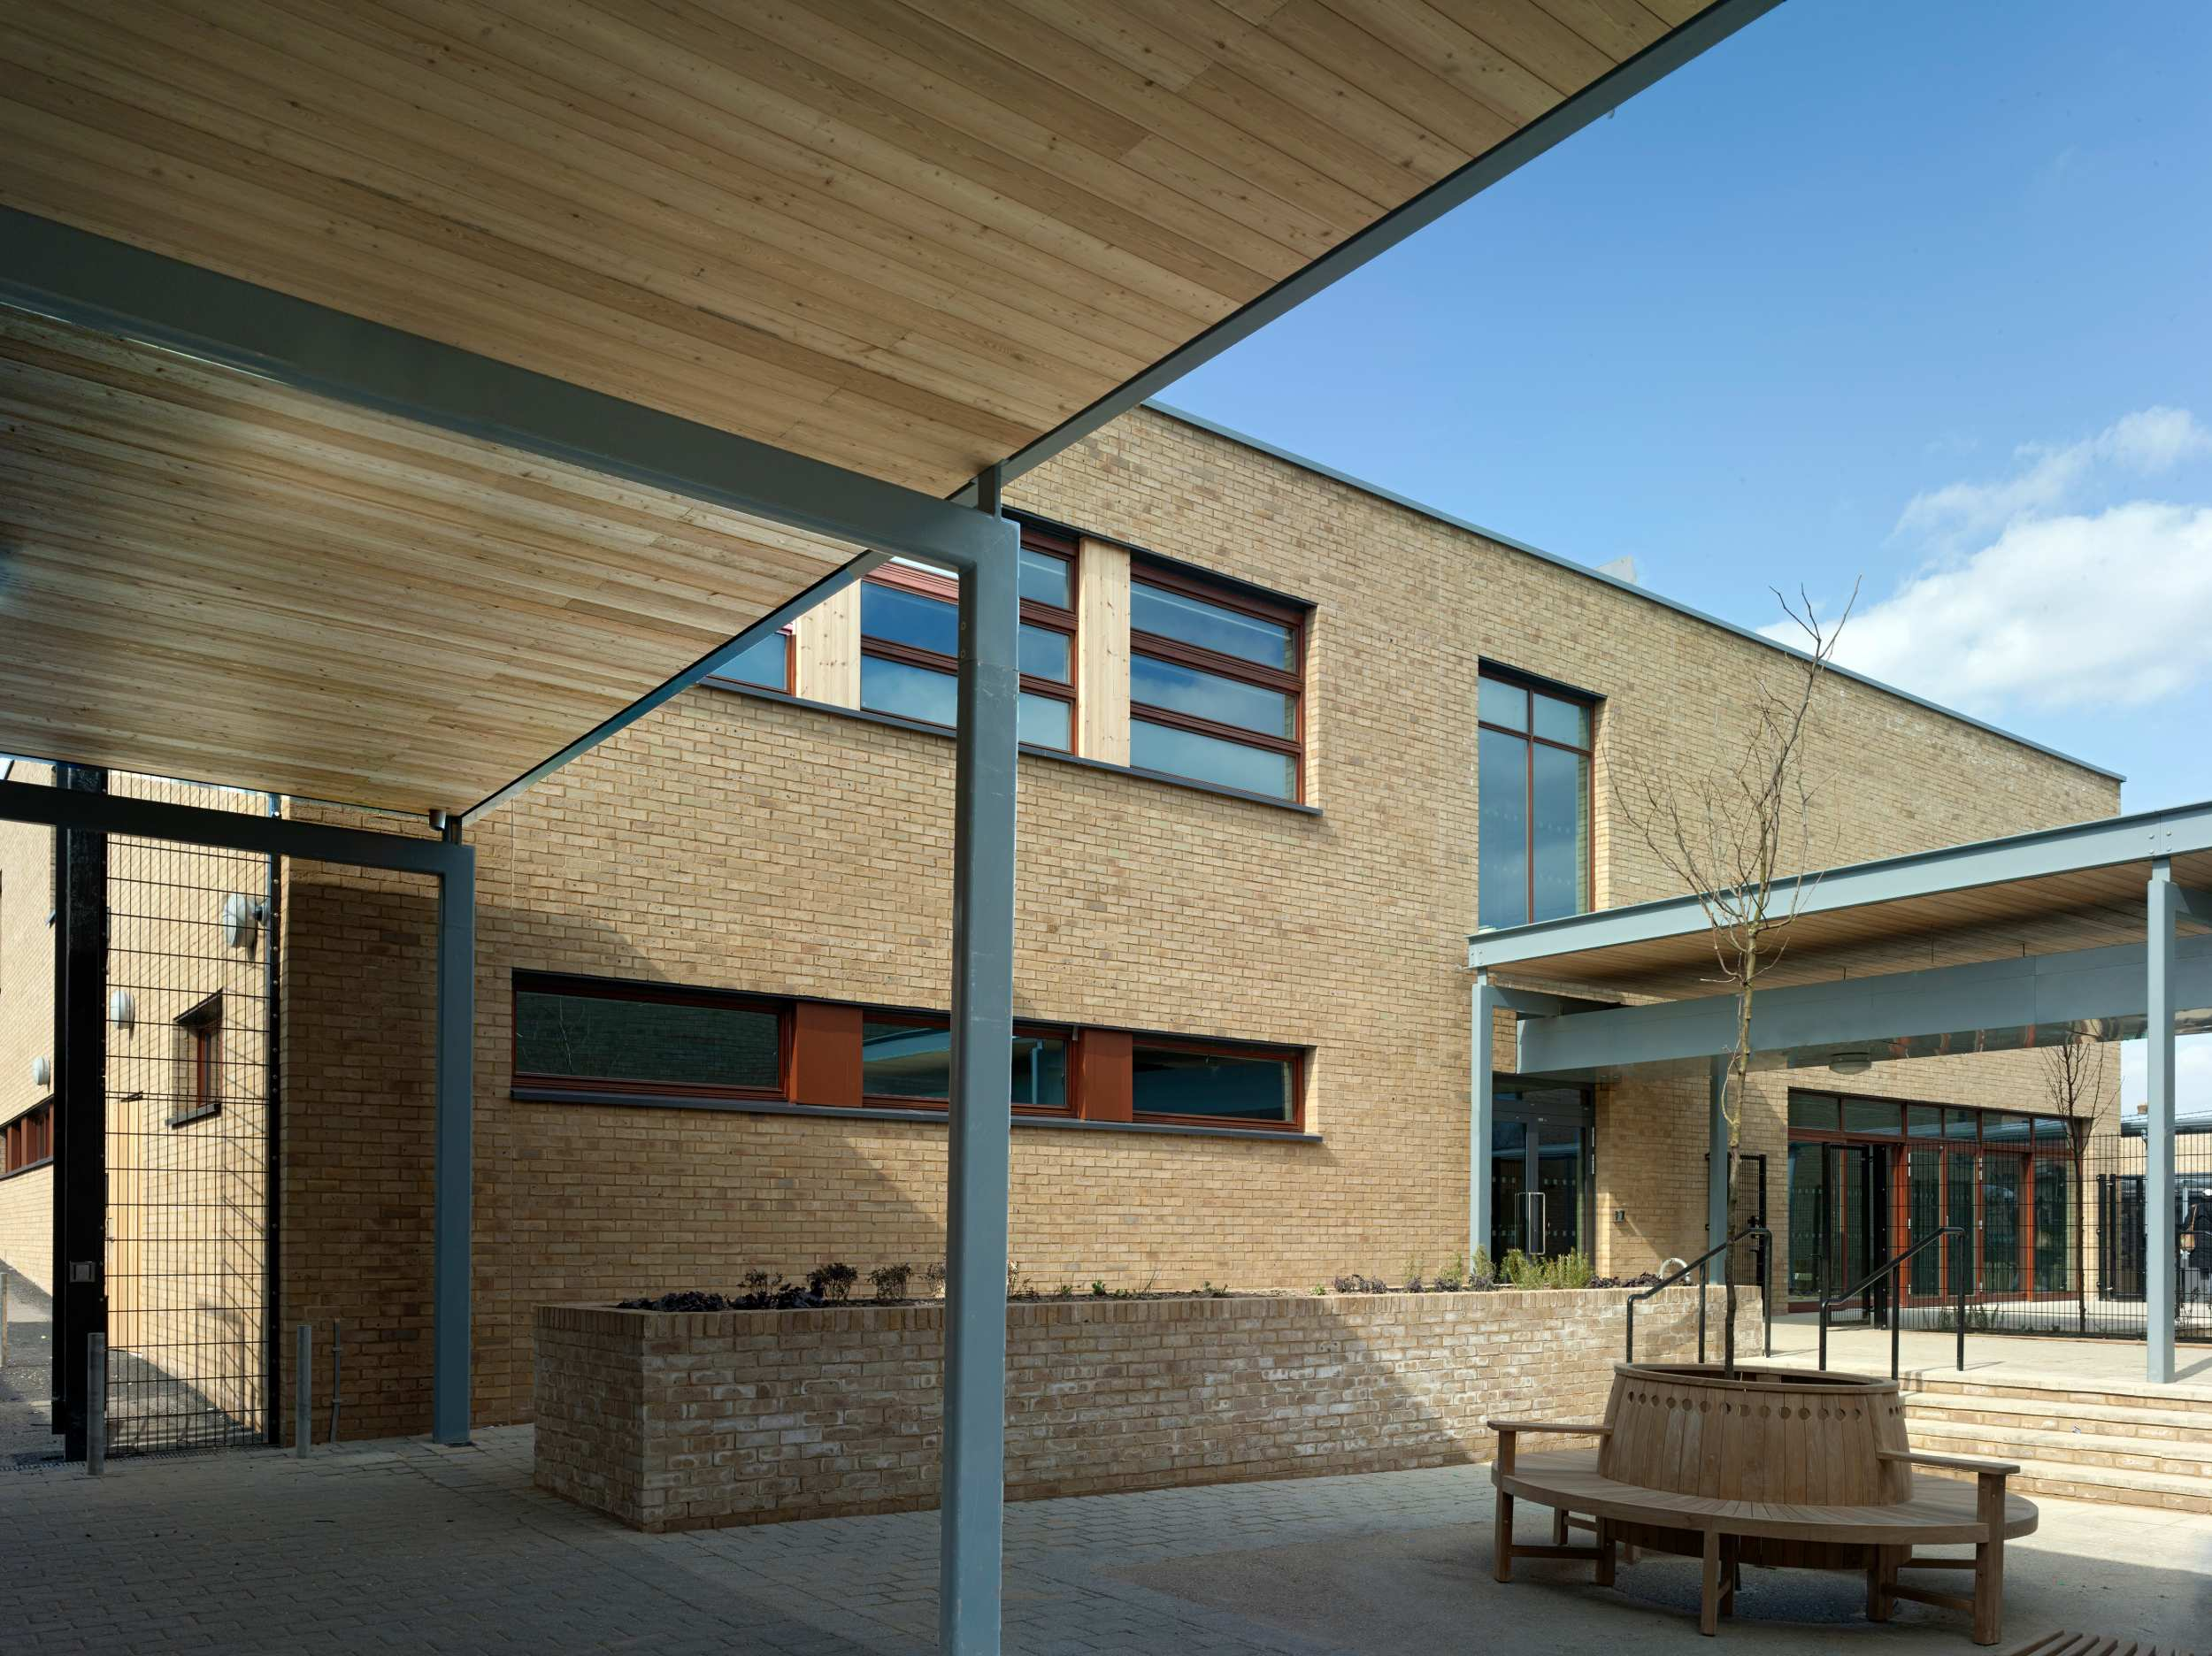 Pendragon School, London